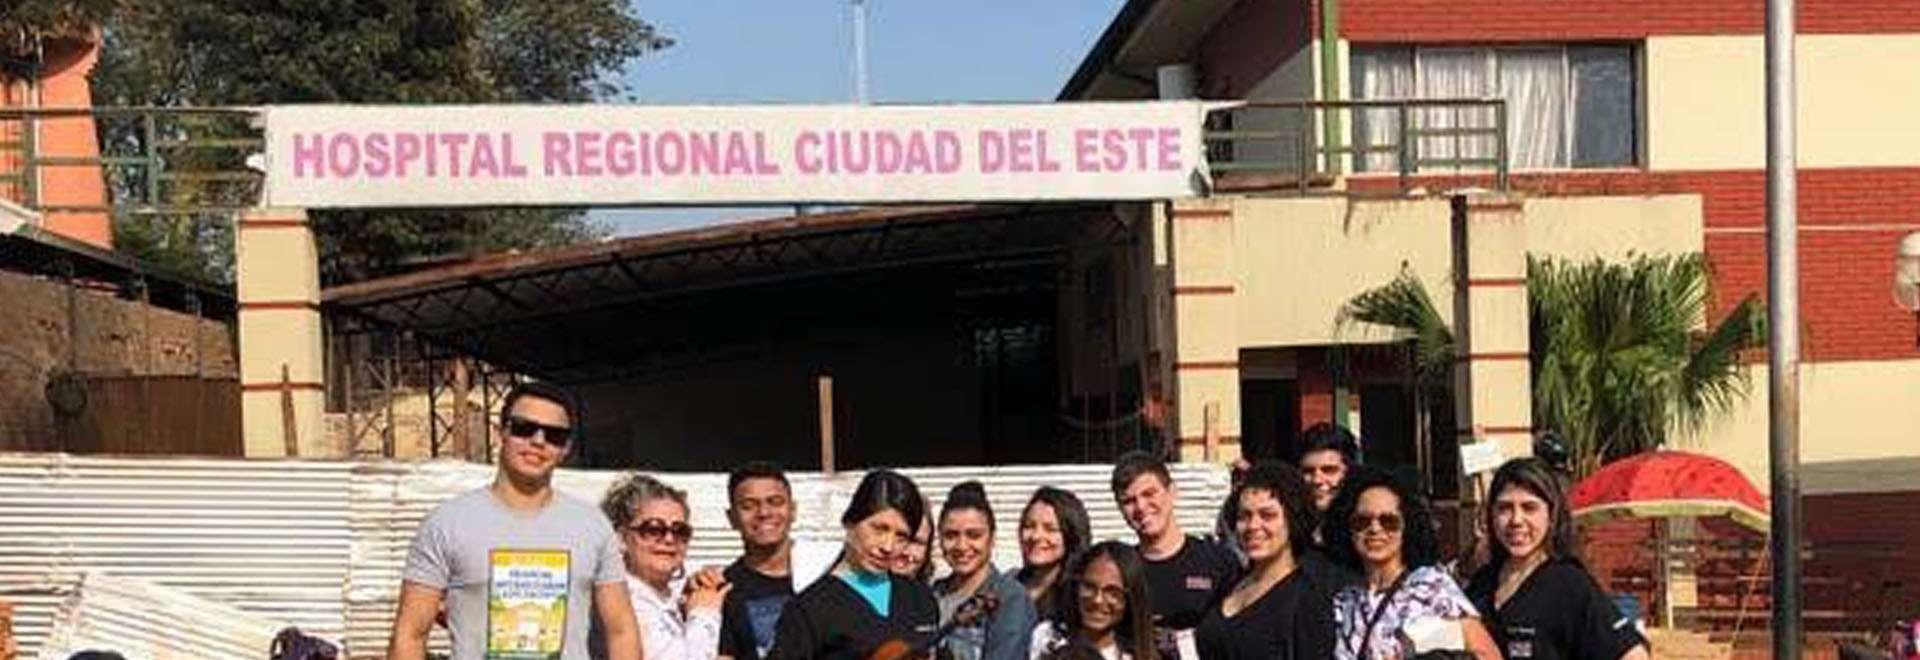 Jovens da Igreja Cristã Maranata visitam Hospital no Paraguai